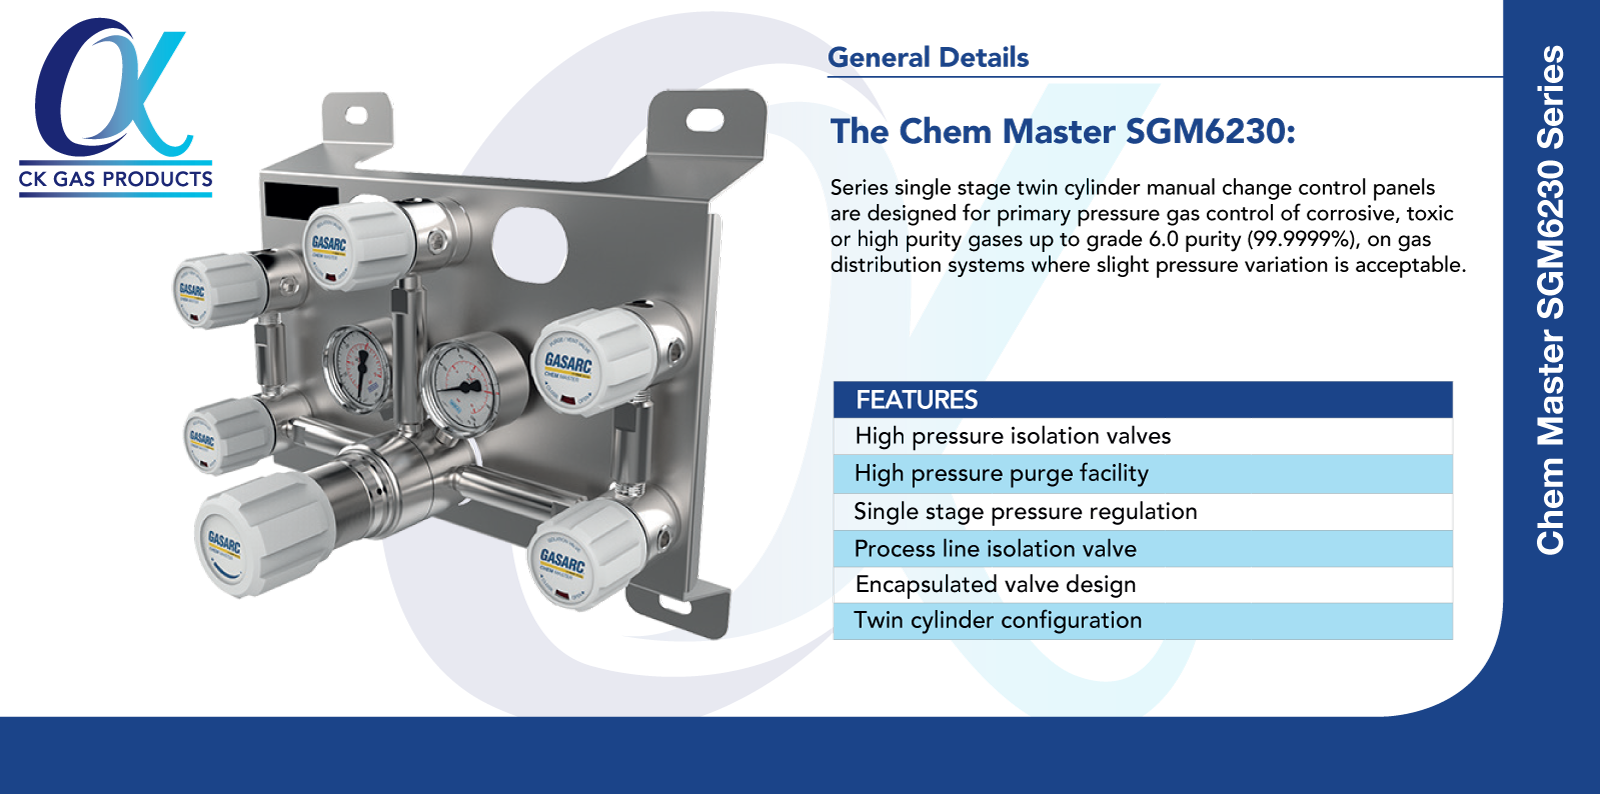 ChemMaster_SGM6230